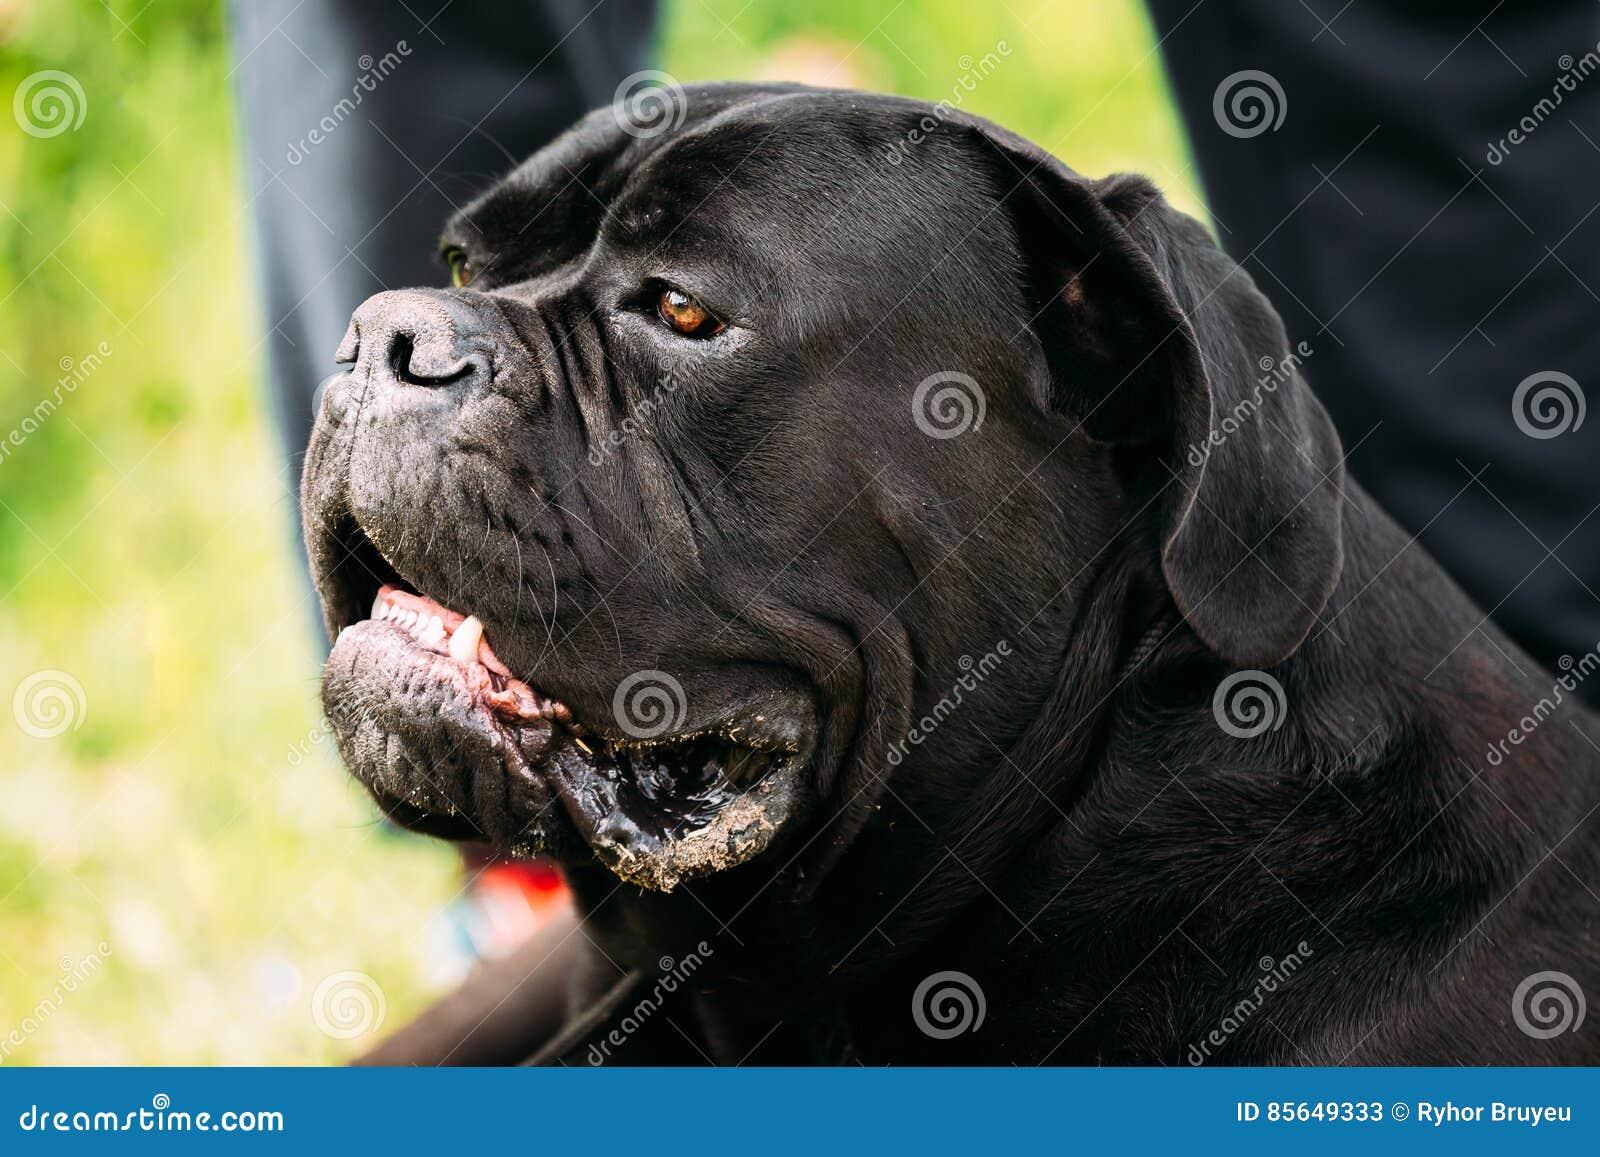 Close Up Head Of Black Young Cane Corso Dog Big Dog Breeds Stock